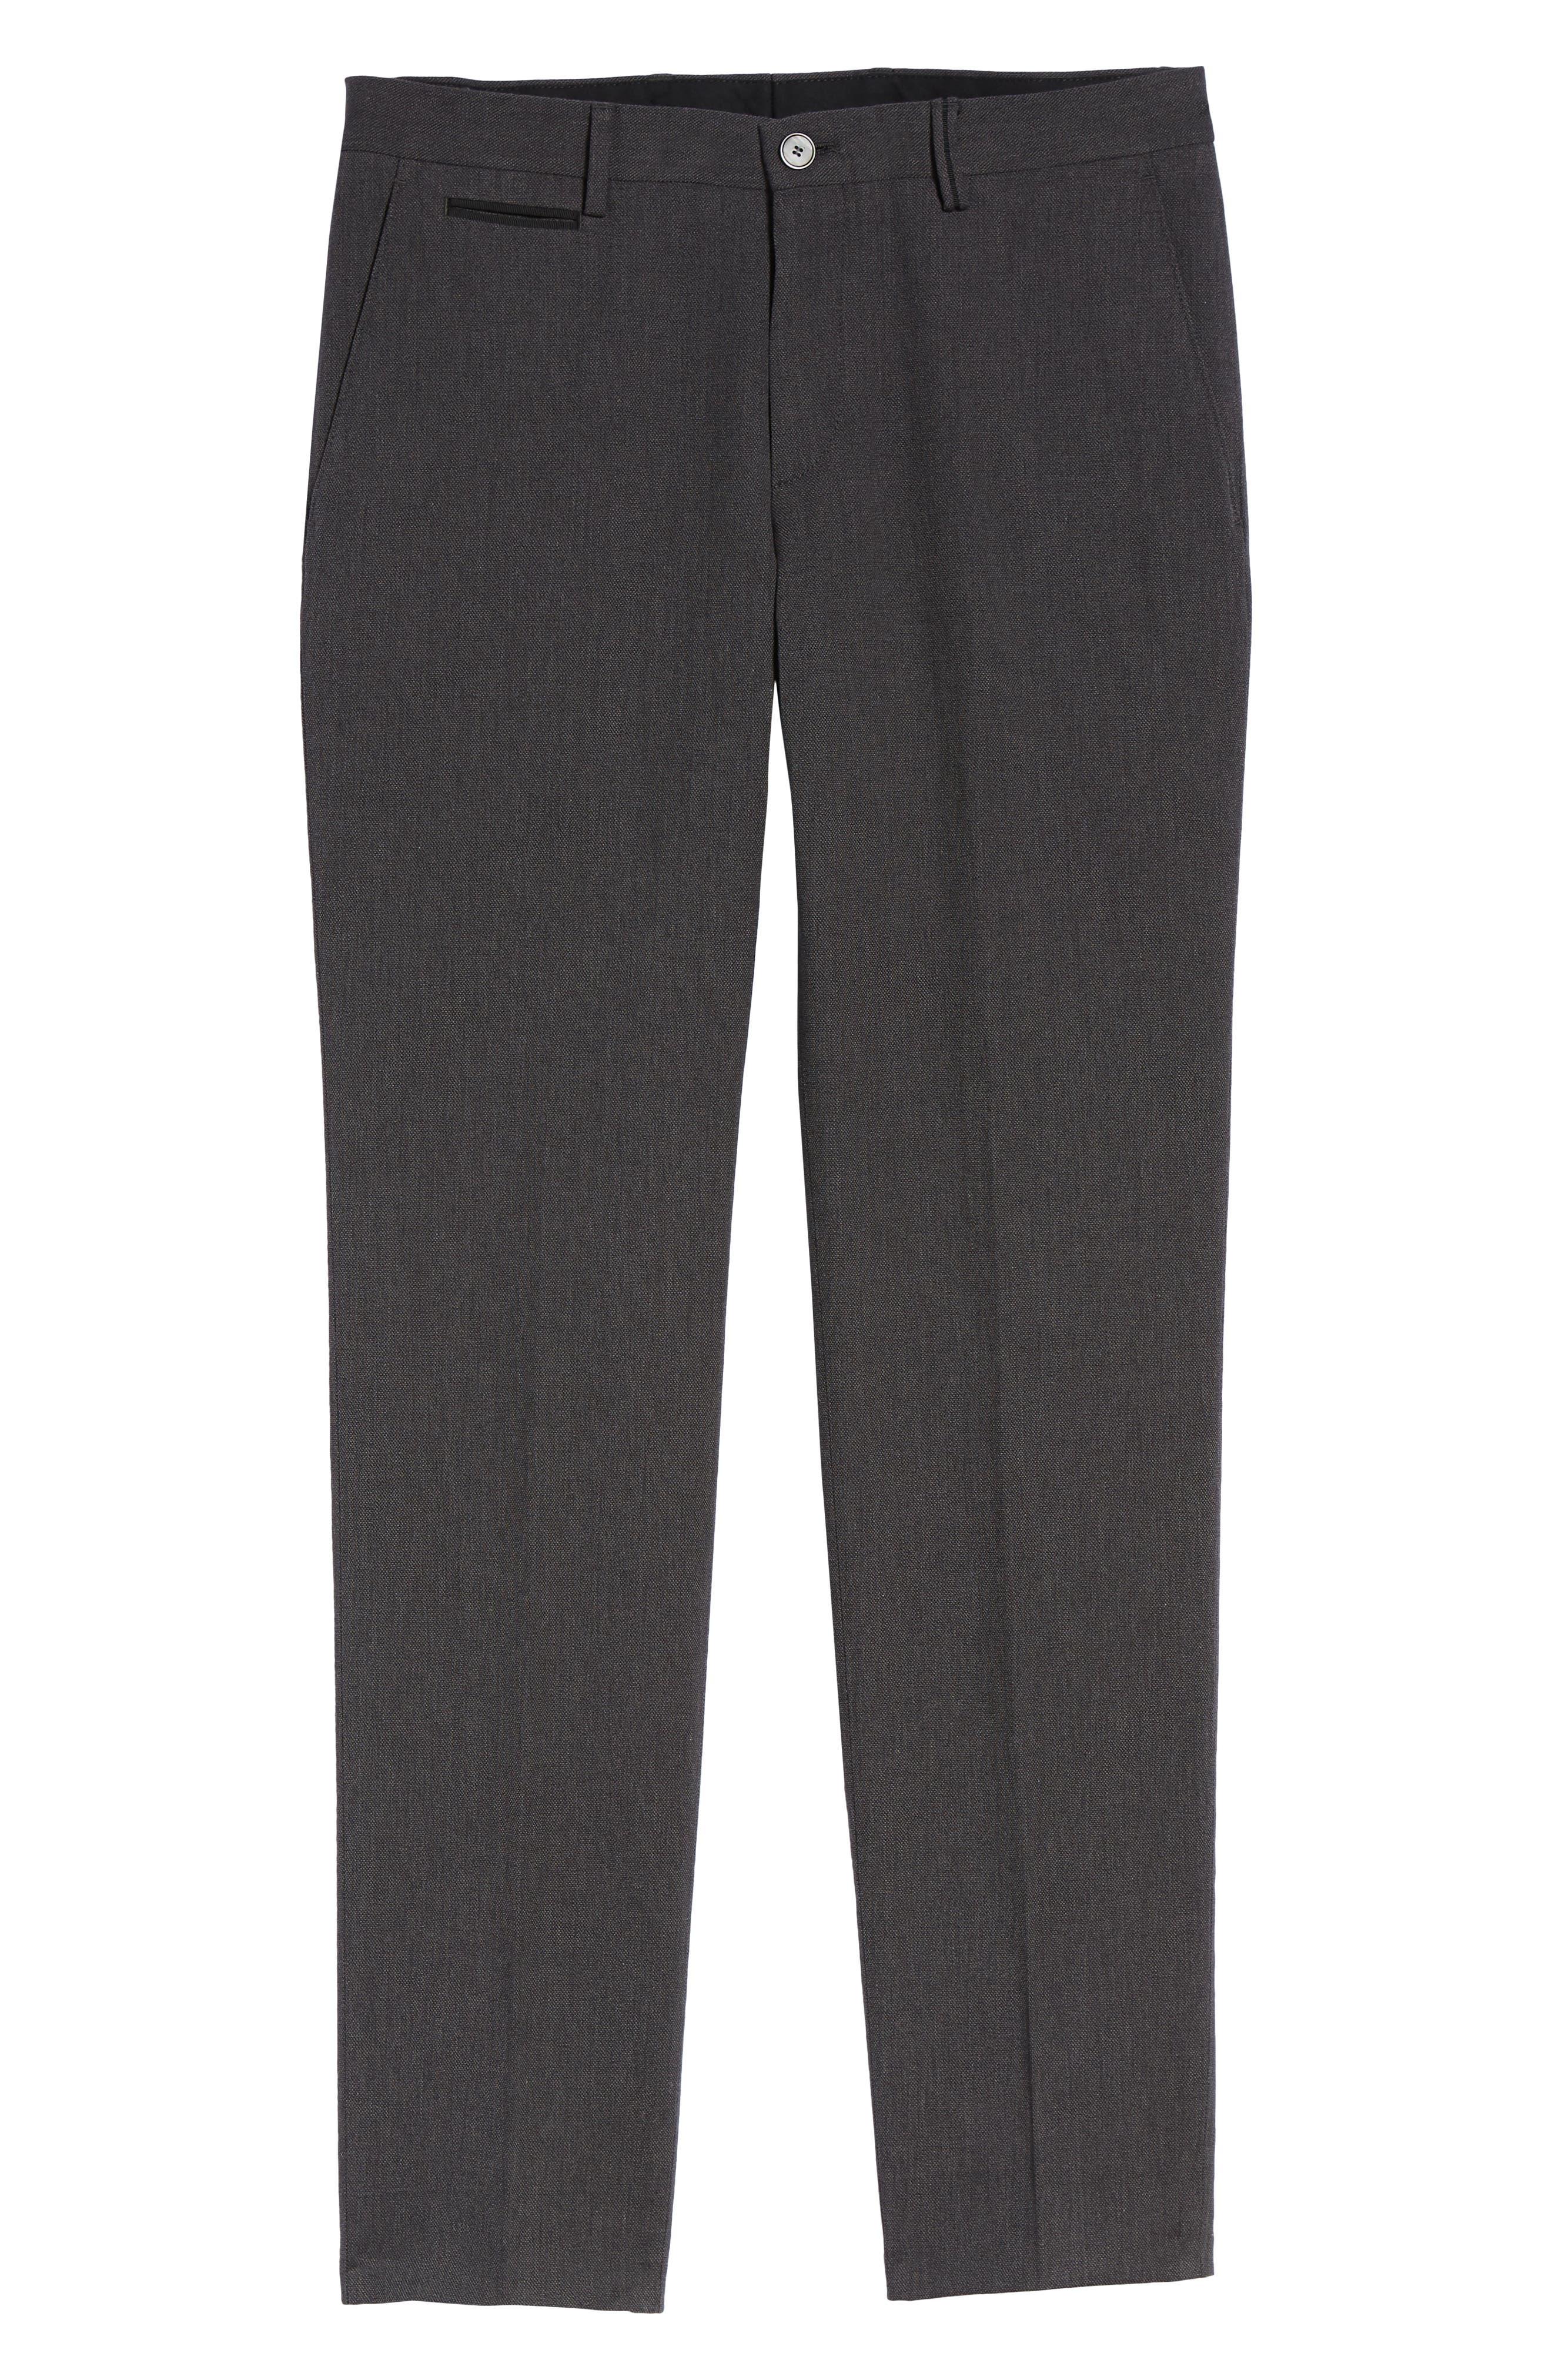 Batho Flat Front Solid Cotton Trousers,                             Alternate thumbnail 6, color,                             MEDIUM GREY